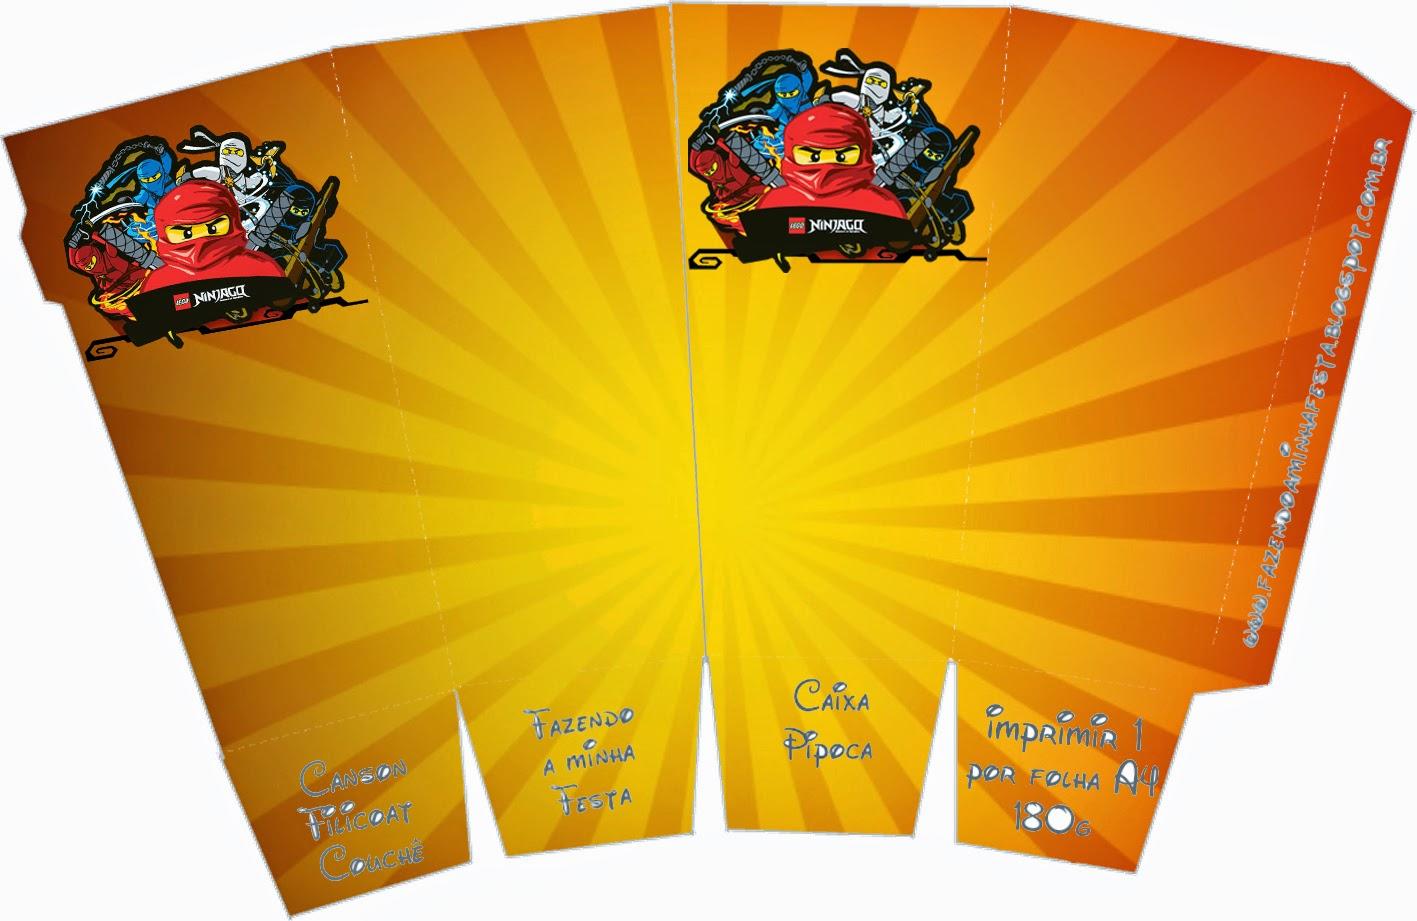 Ninjago Free Printable Boxes Oh My Fiesta For Geeks